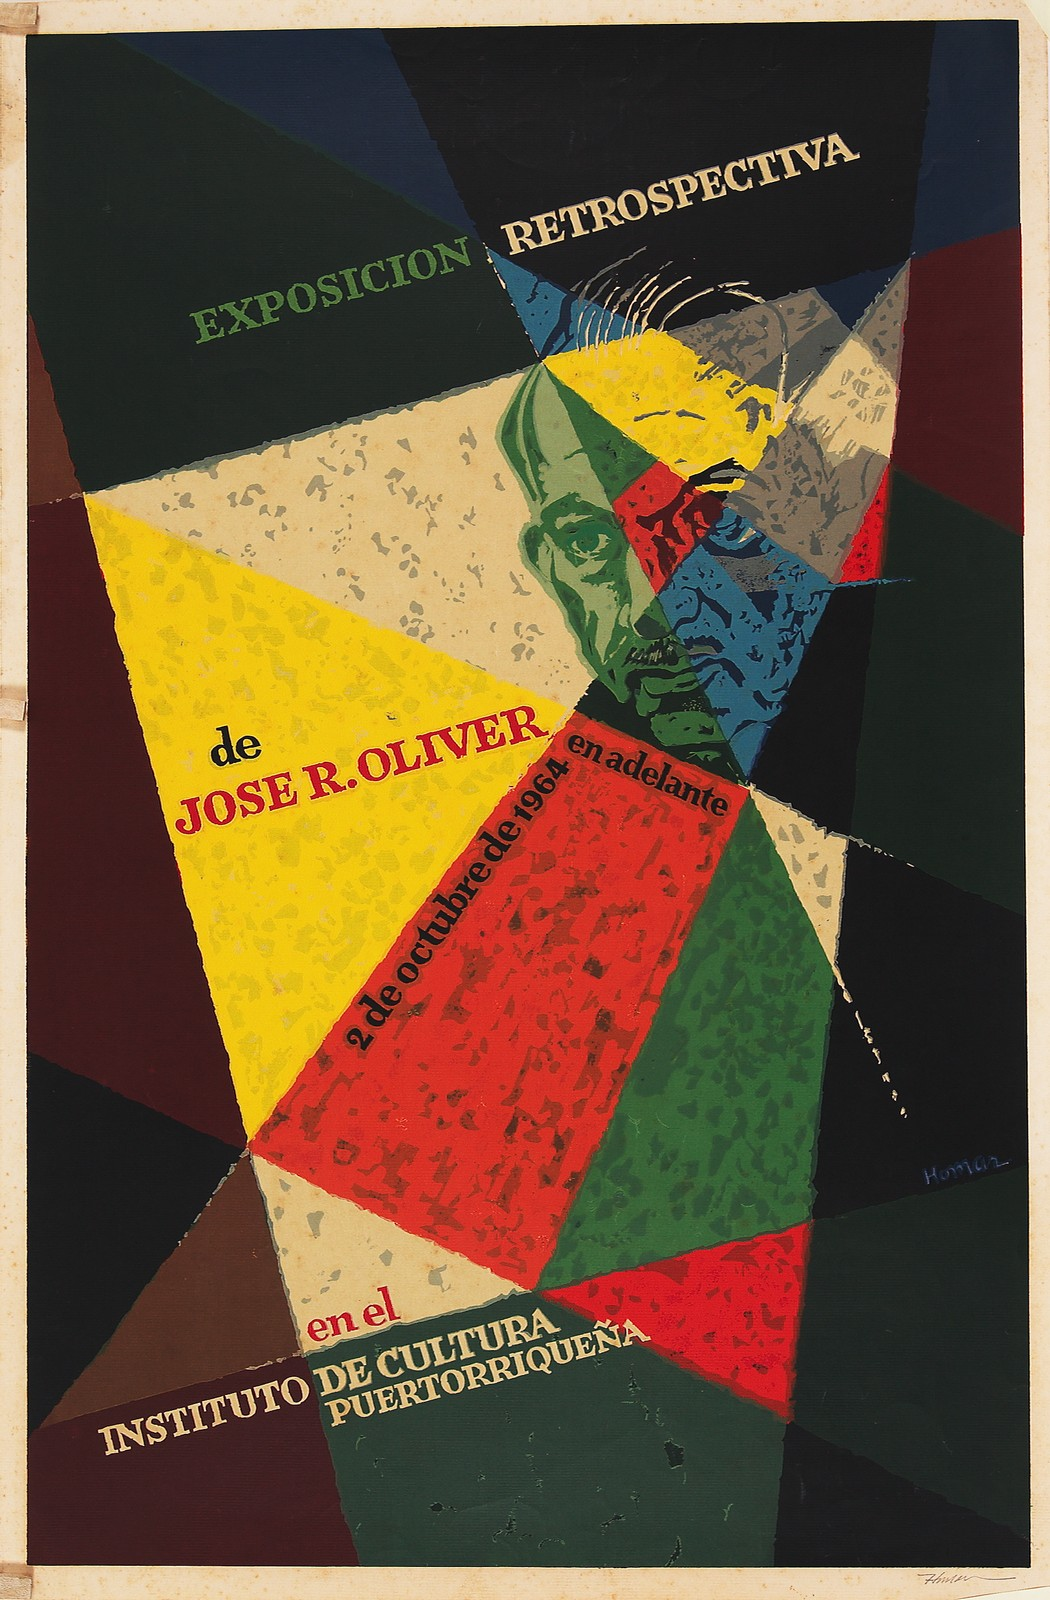 José R. Oliver Retrospective